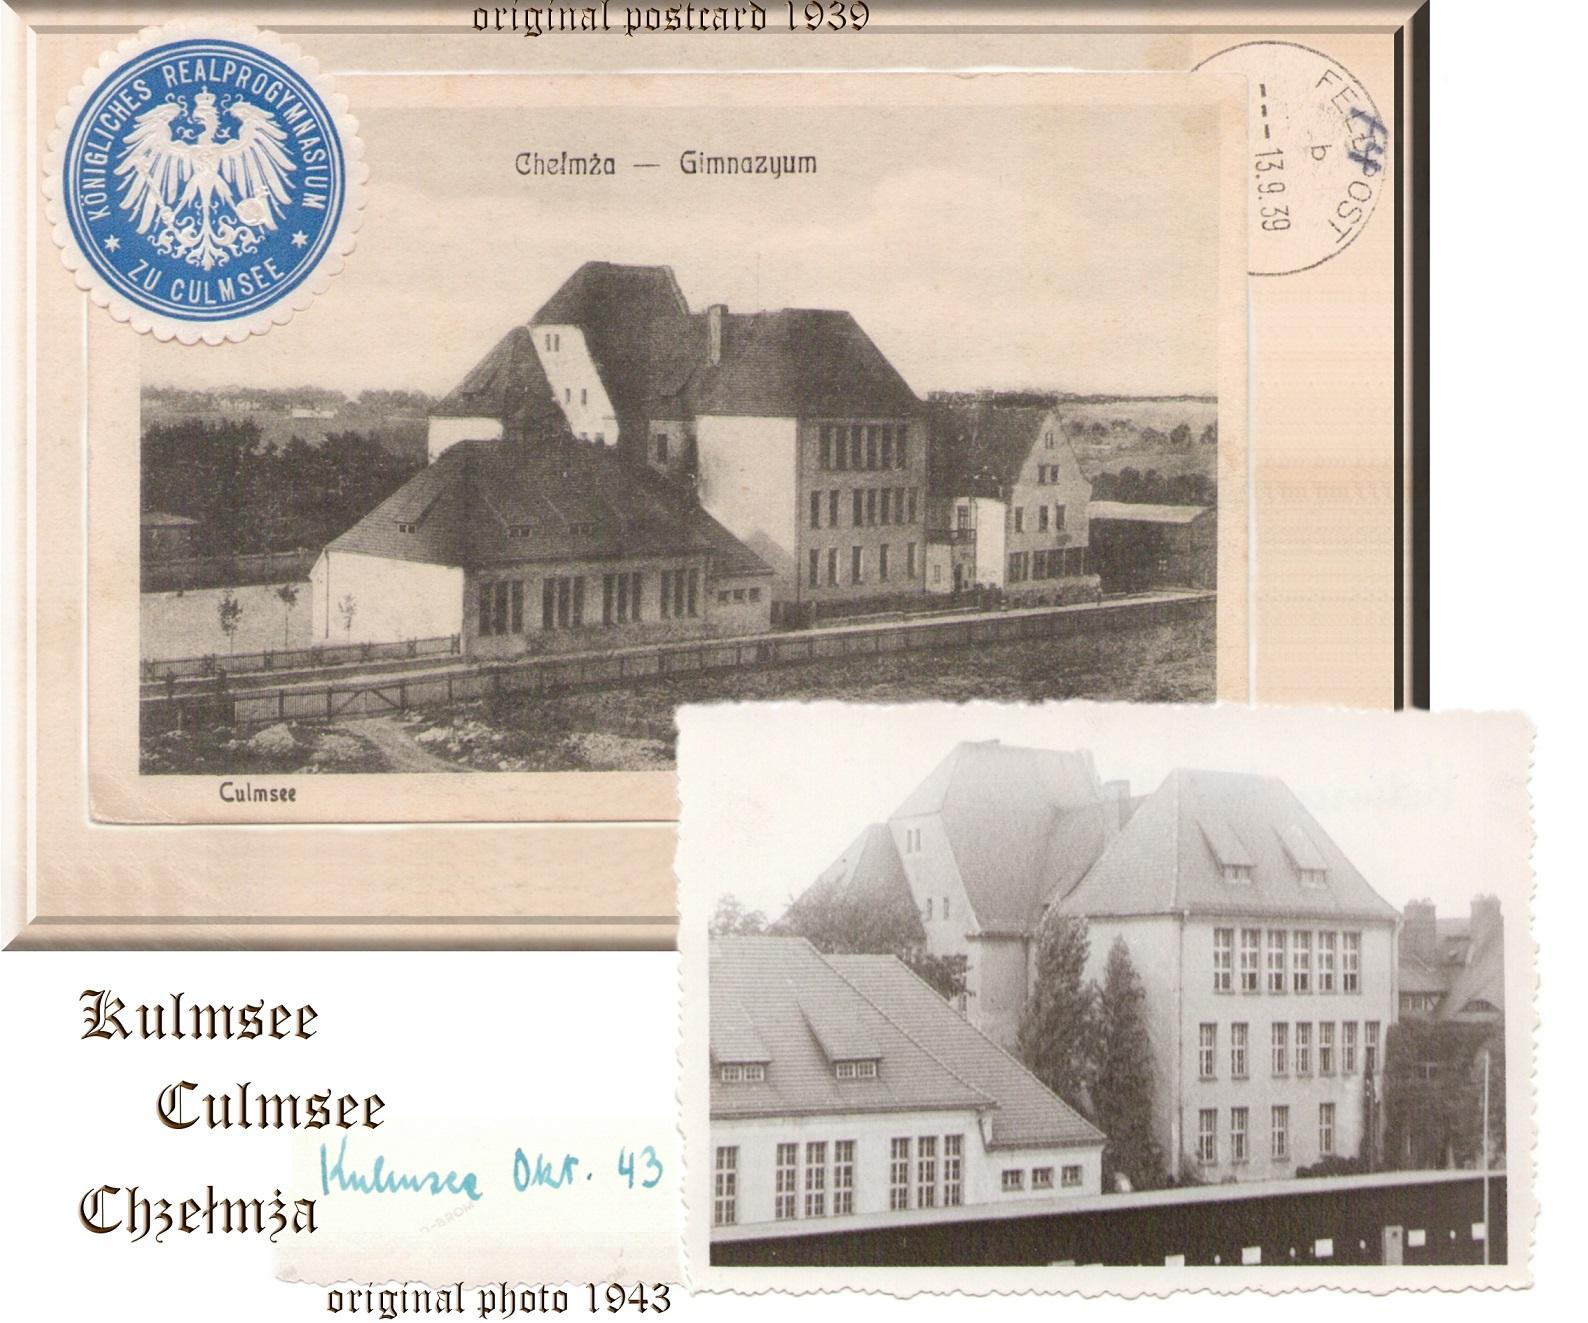 Gymnasium Chelmza / Culmsee incl. Siegelmarke